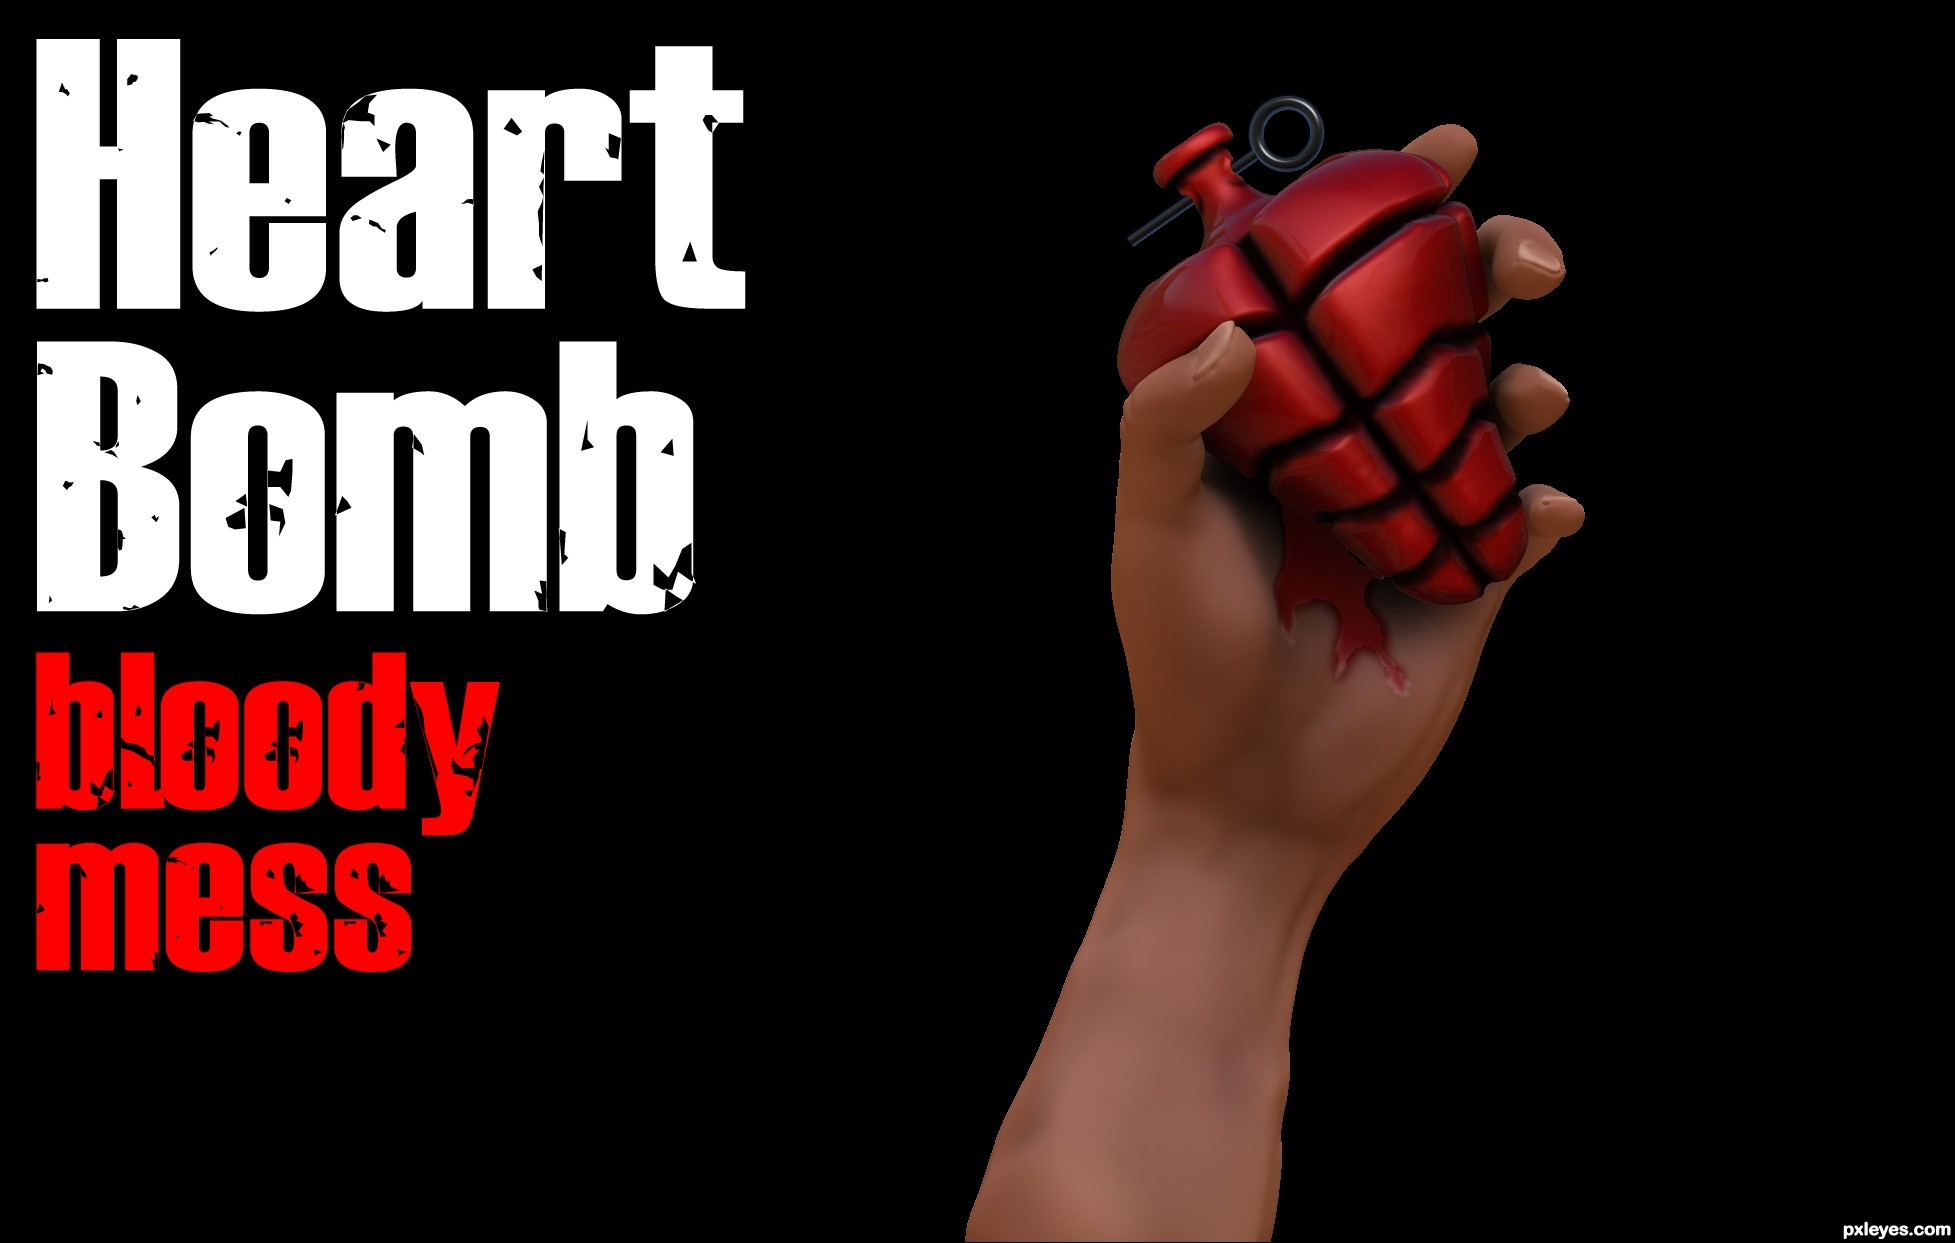 Green Day Heart Logo Heart bomb - created by